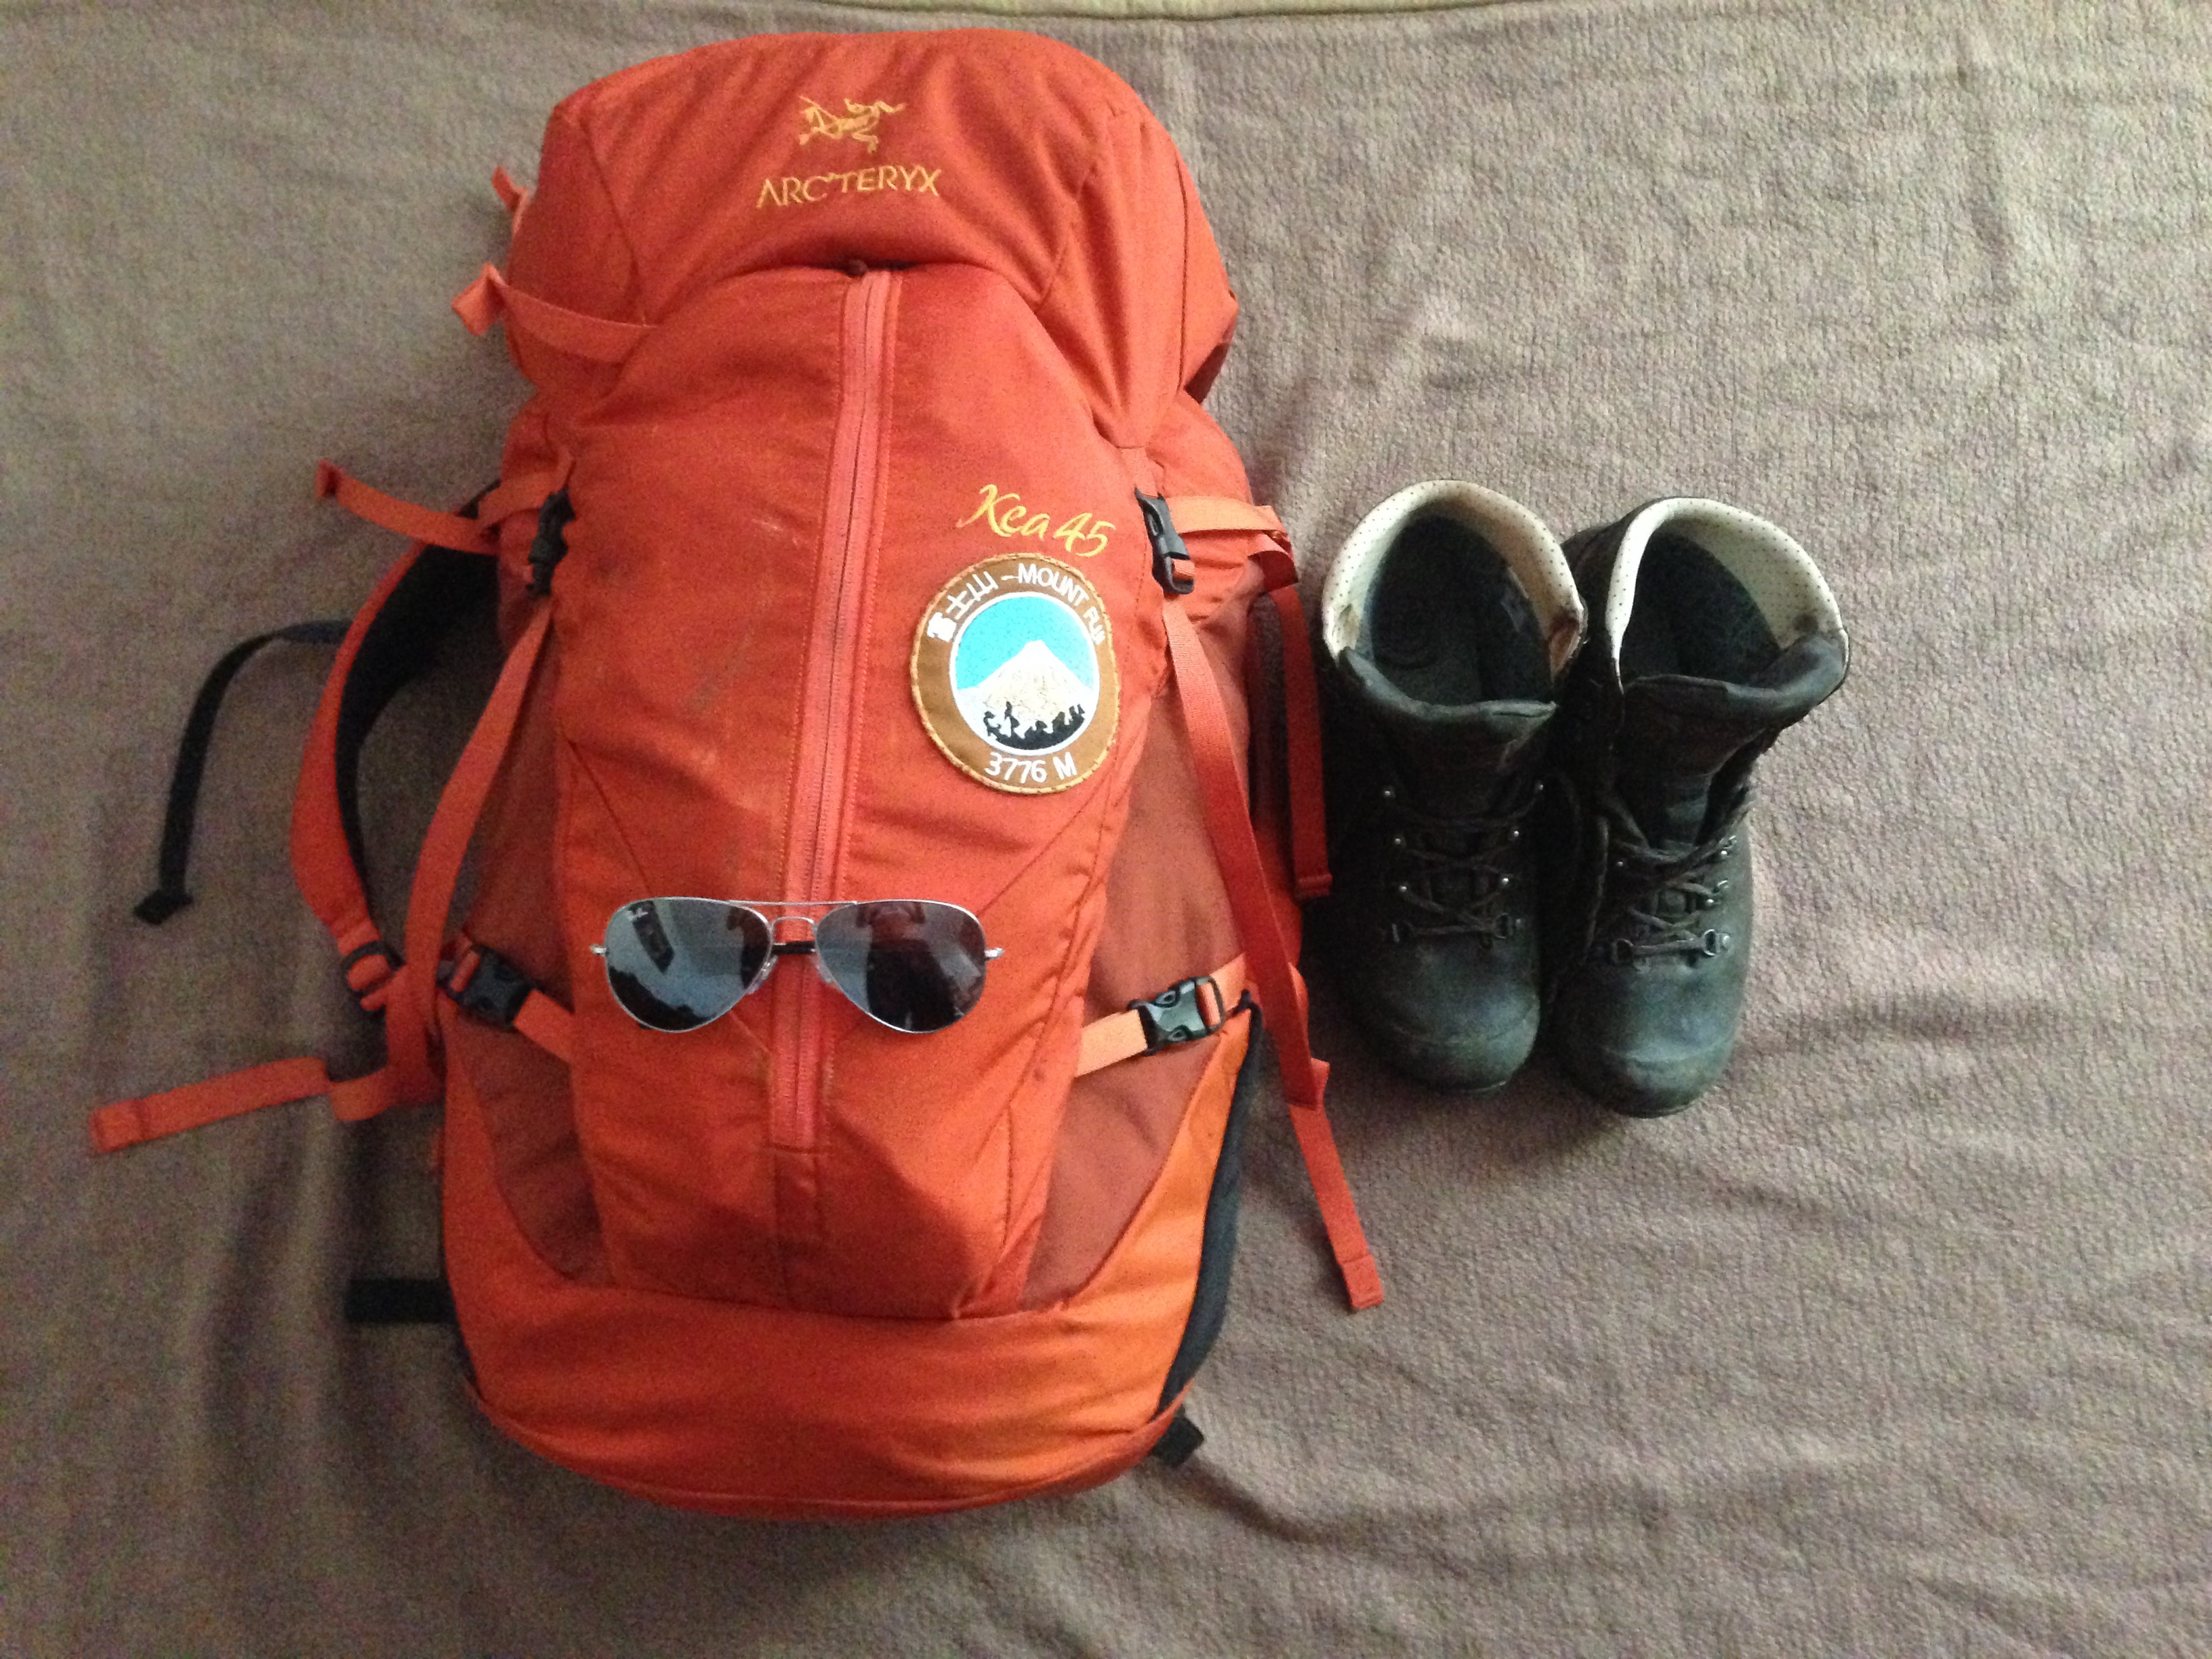 Kilimanjaro Packing List - Equipment packed